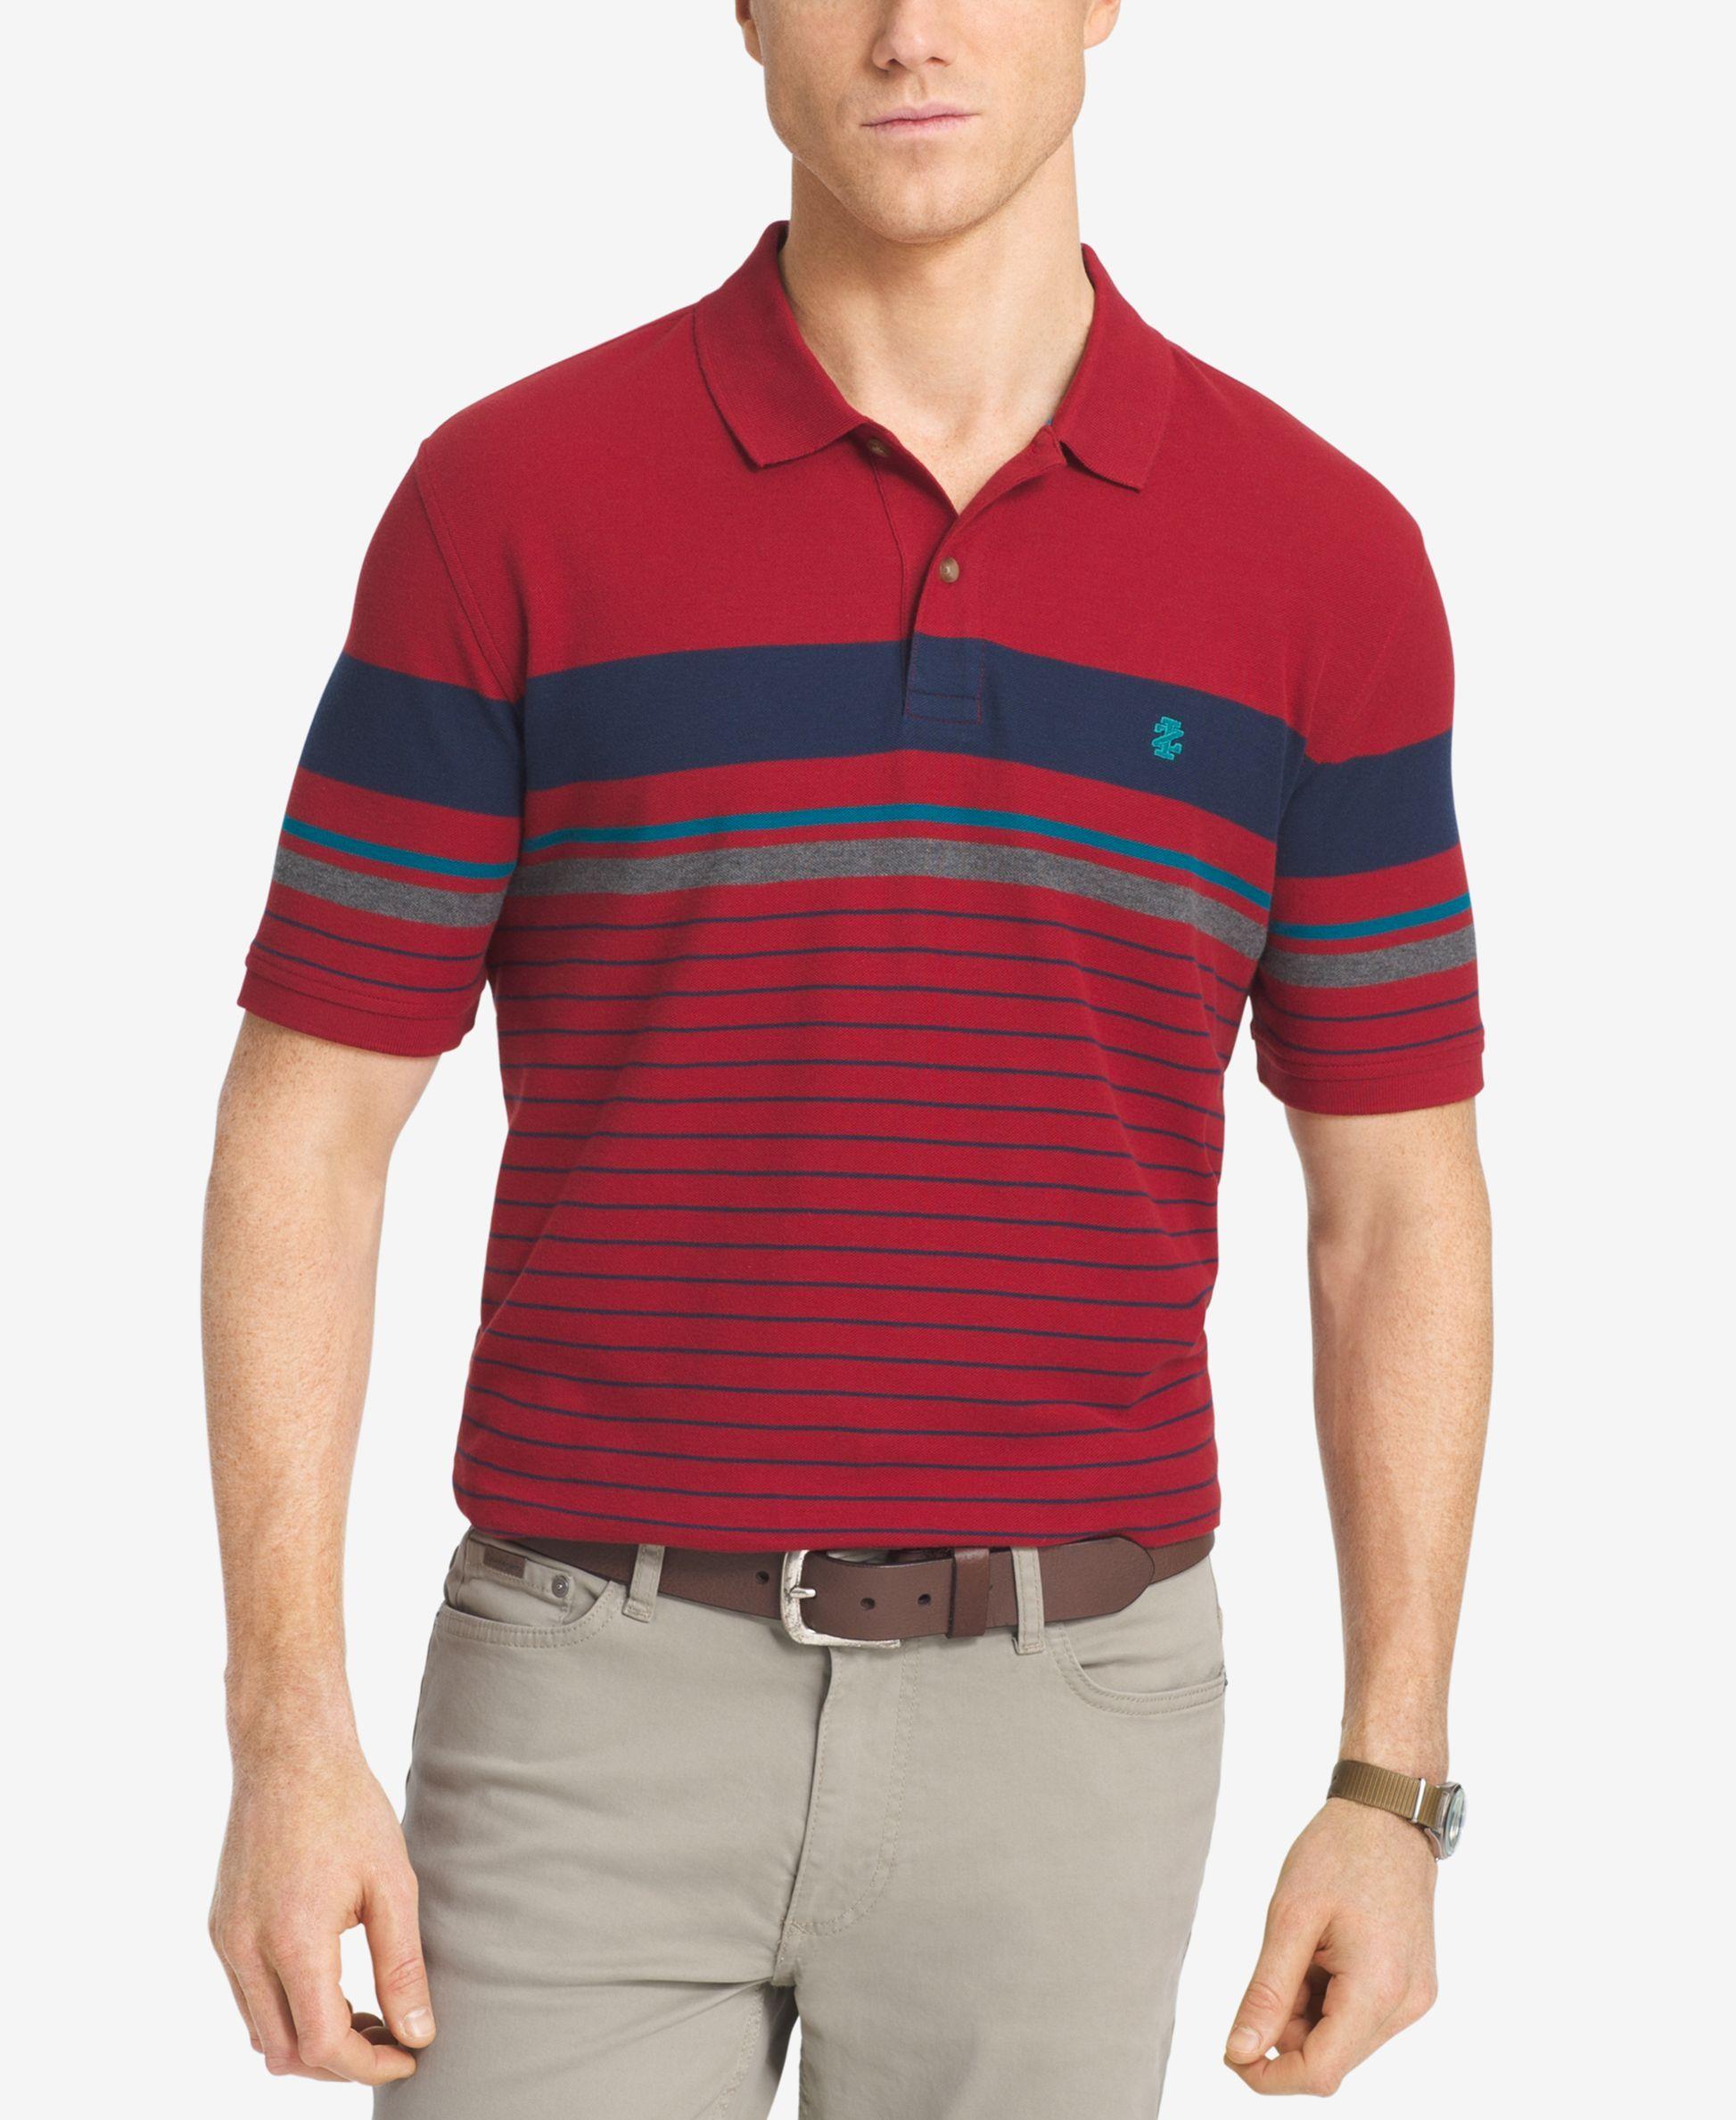 cf4adebd Izod Men's Engineered Striped Polo | SPRING 19 | Polo, Polo Shirt ...